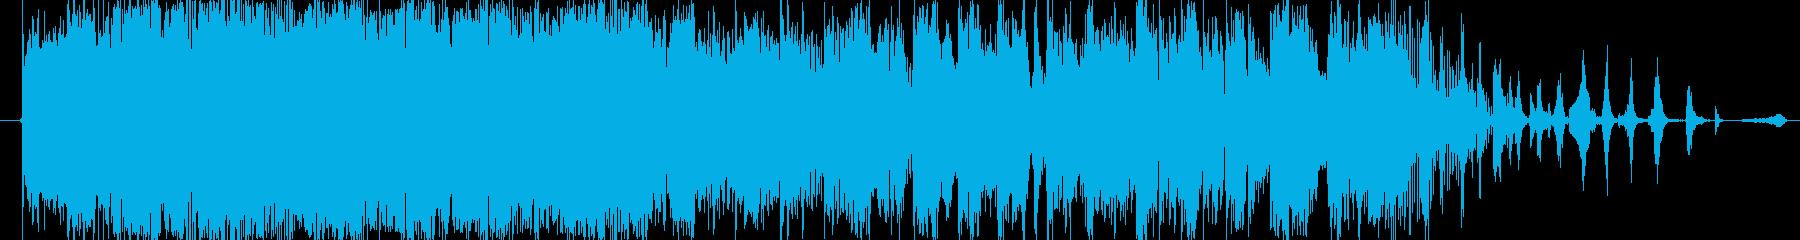 You Tube にぎやかなオープニングの再生済みの波形